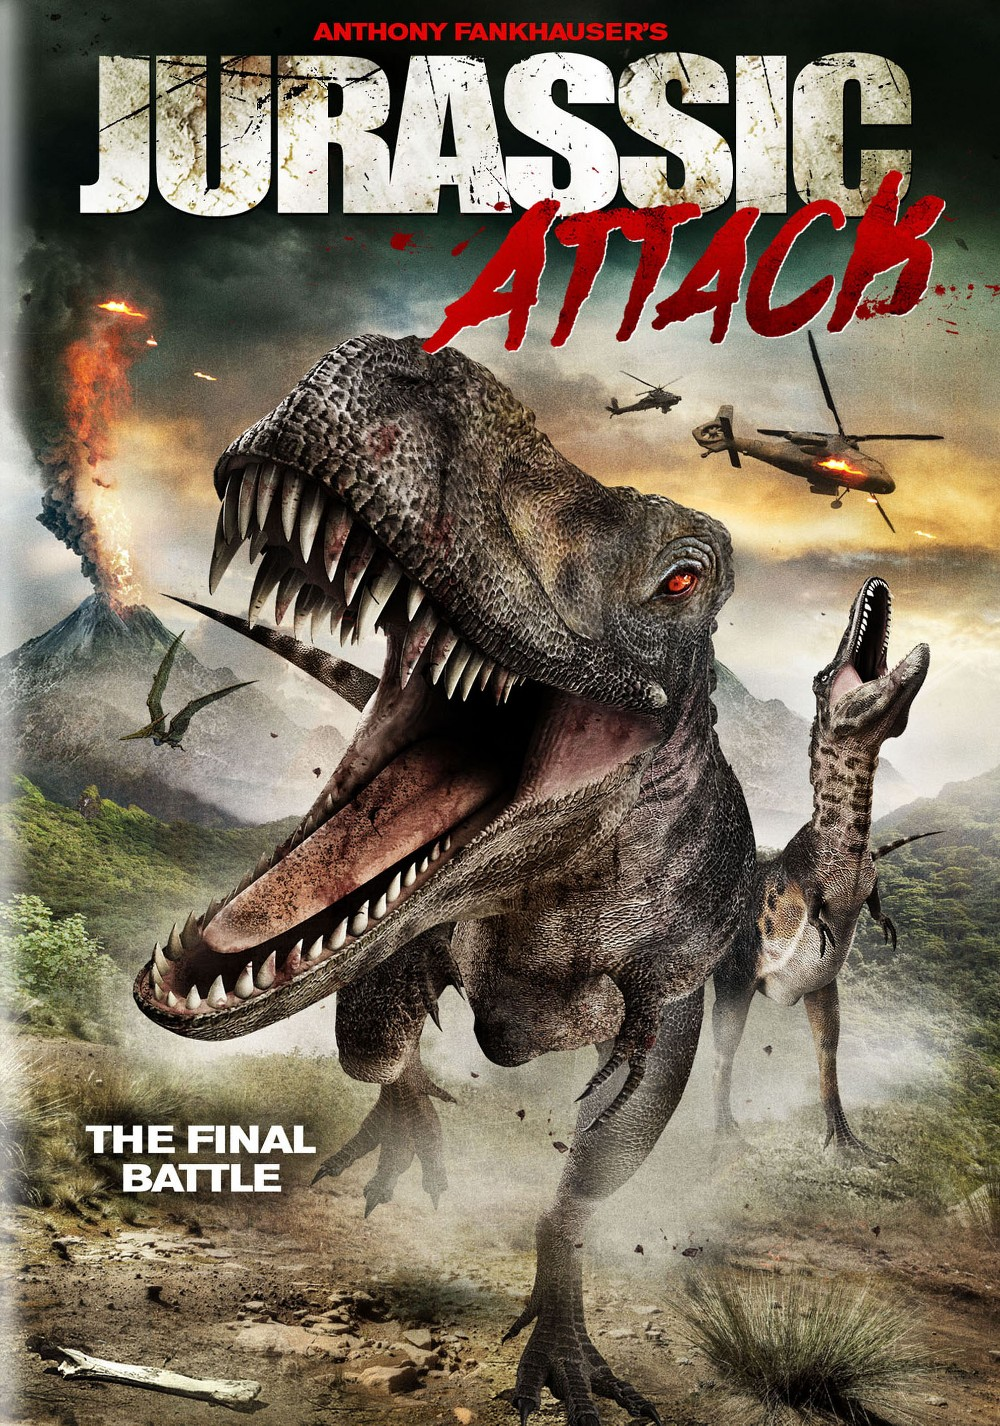 Jurassic attack (Dvd), Movies